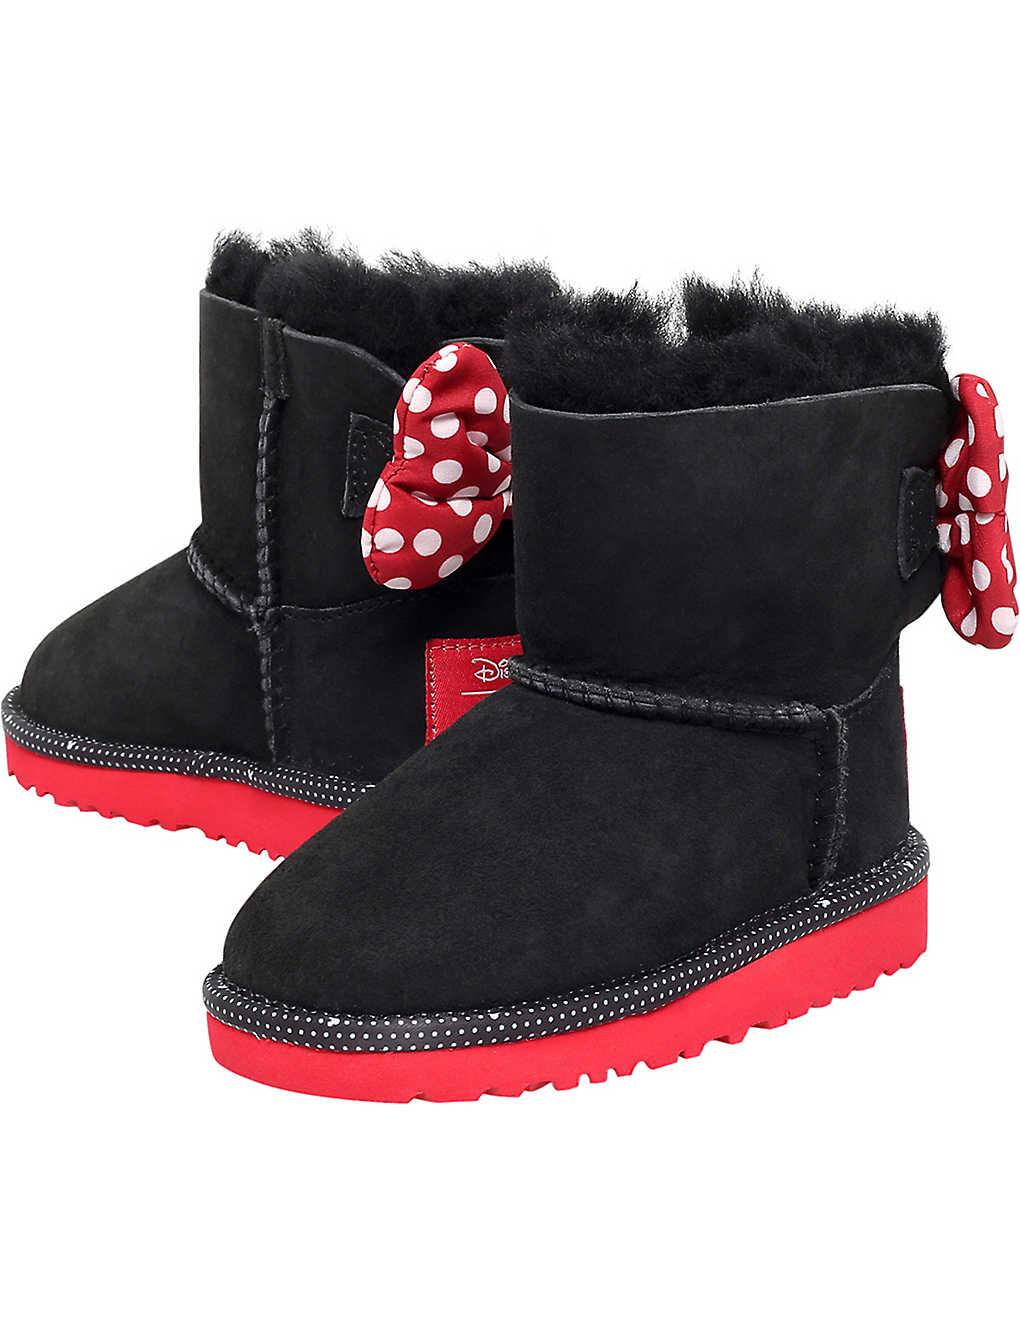 40c4c6e856b UGG - UGG x Disney Sweetie bow sheepskin boots 7-8 years ...